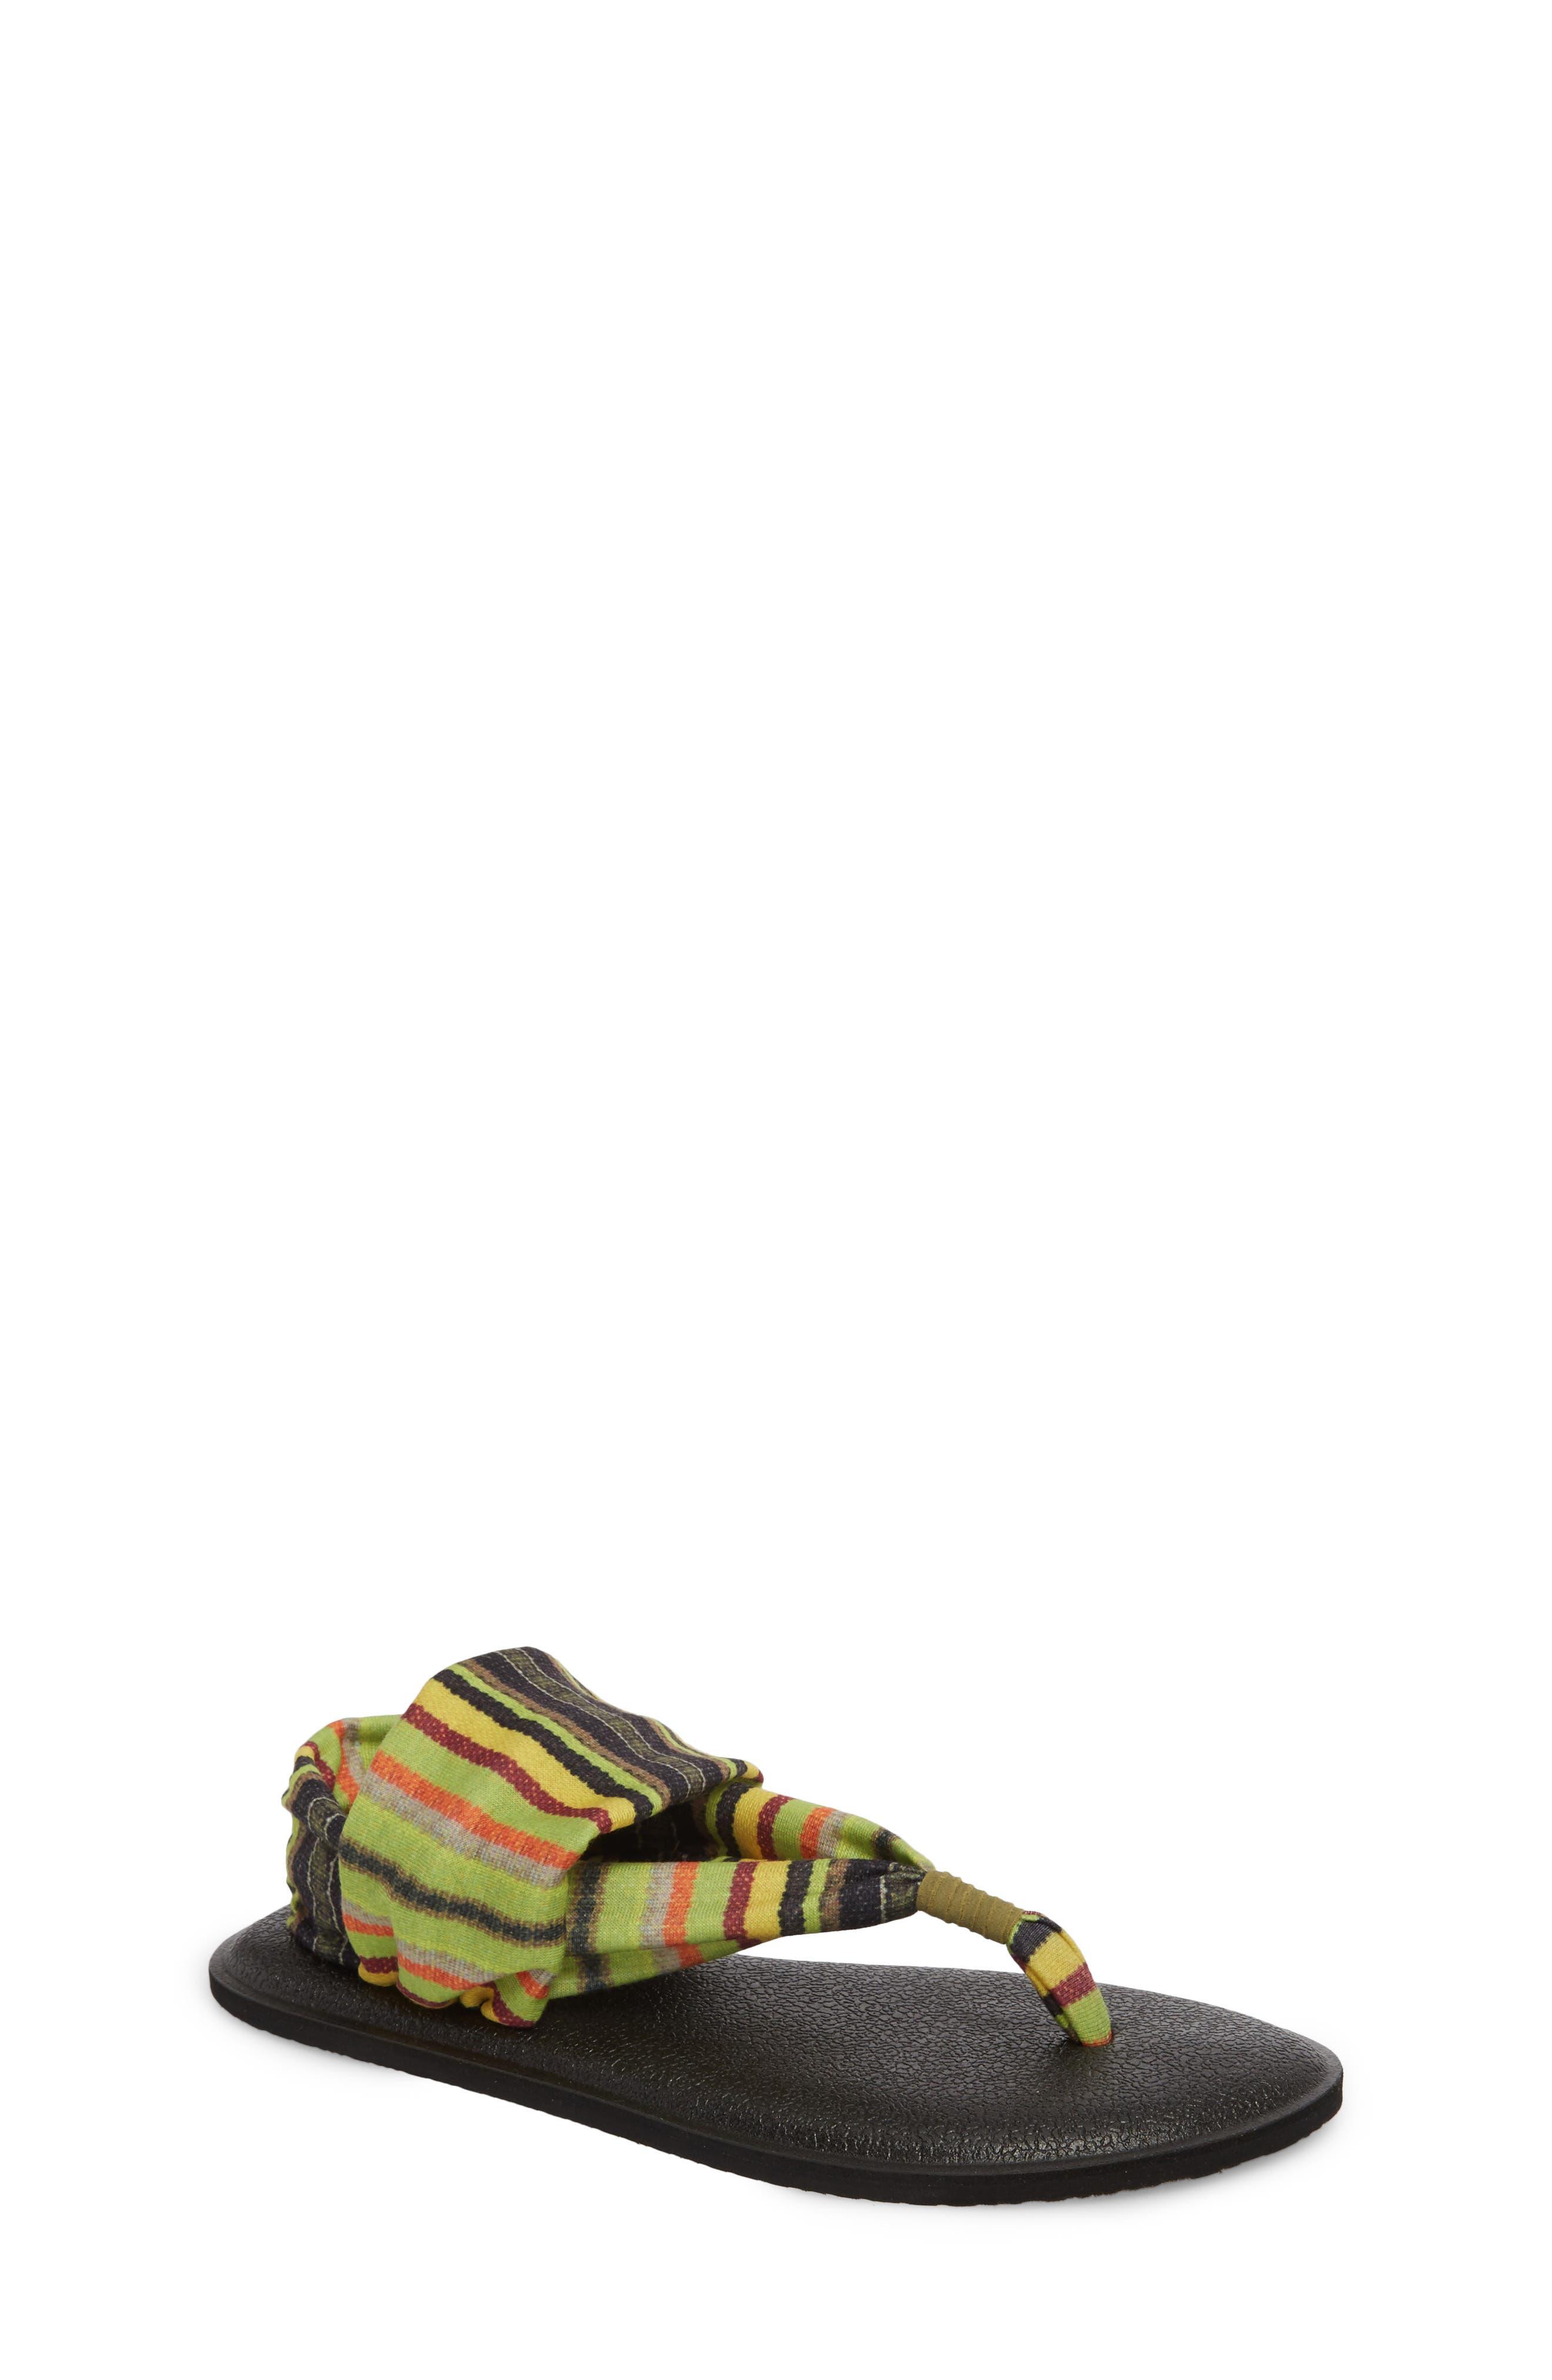 Yoga Sling Burst Sandal,                         Main,                         color, GREEN KAUAI BLANKET